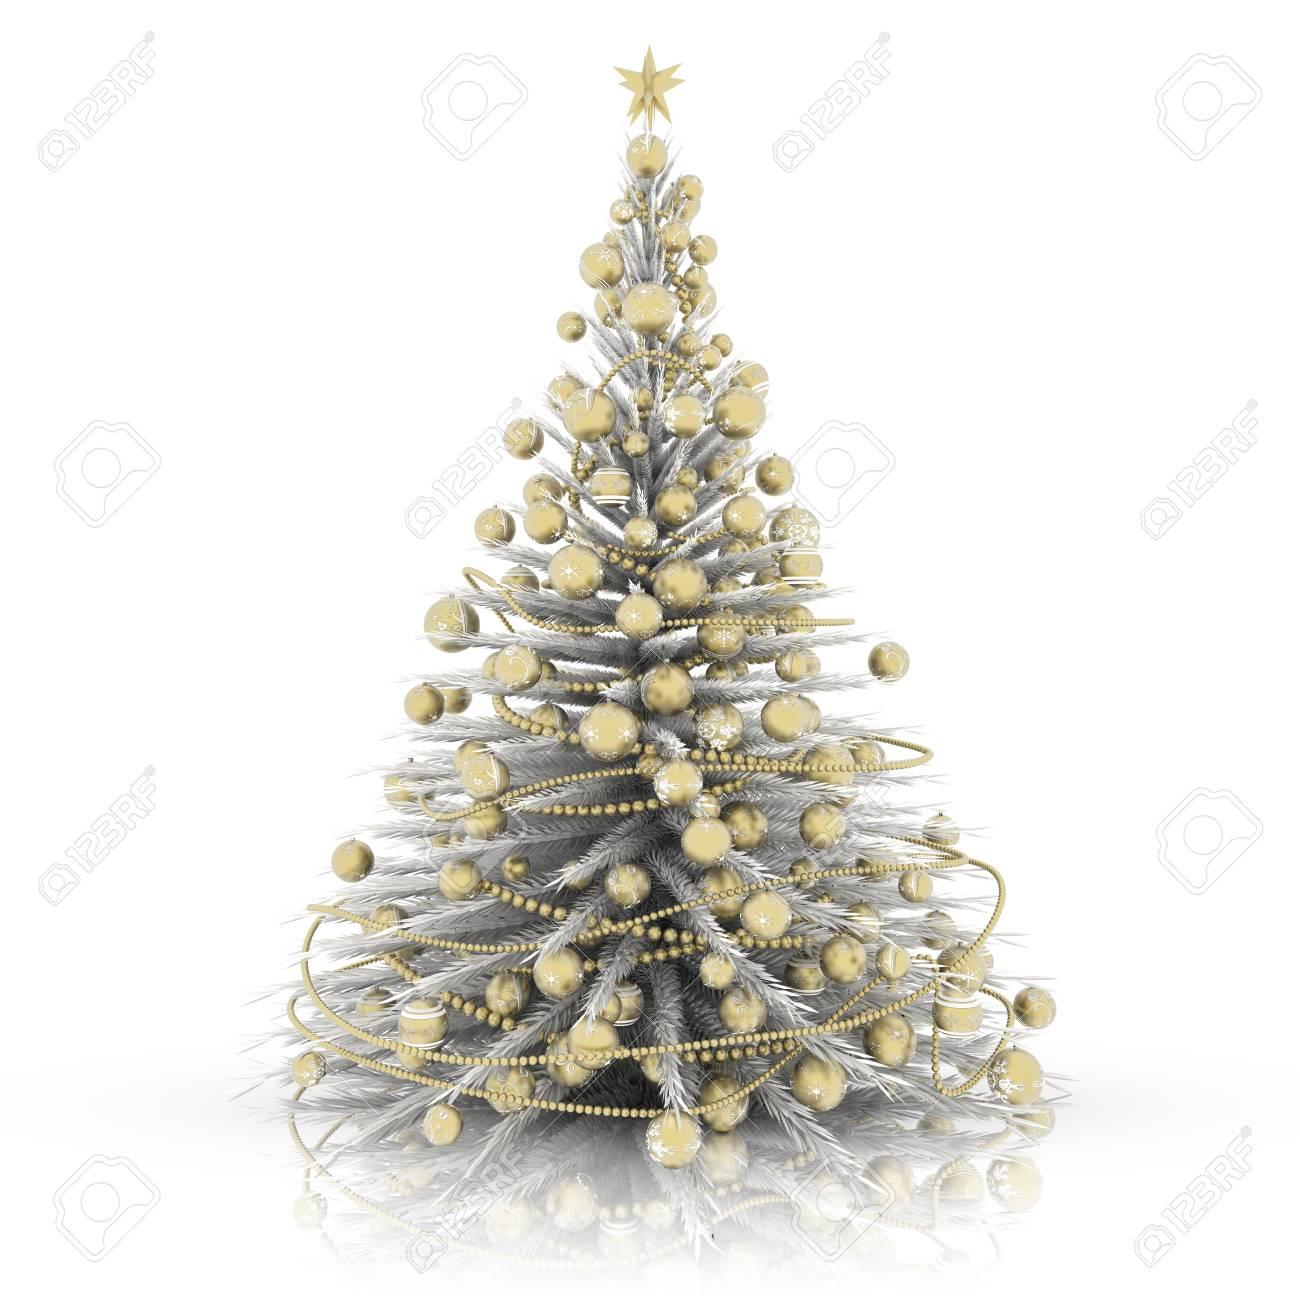 Foto Alberi Di Natale Bianchi decorazione natalizia. albero di natale bianco con decorazioni..